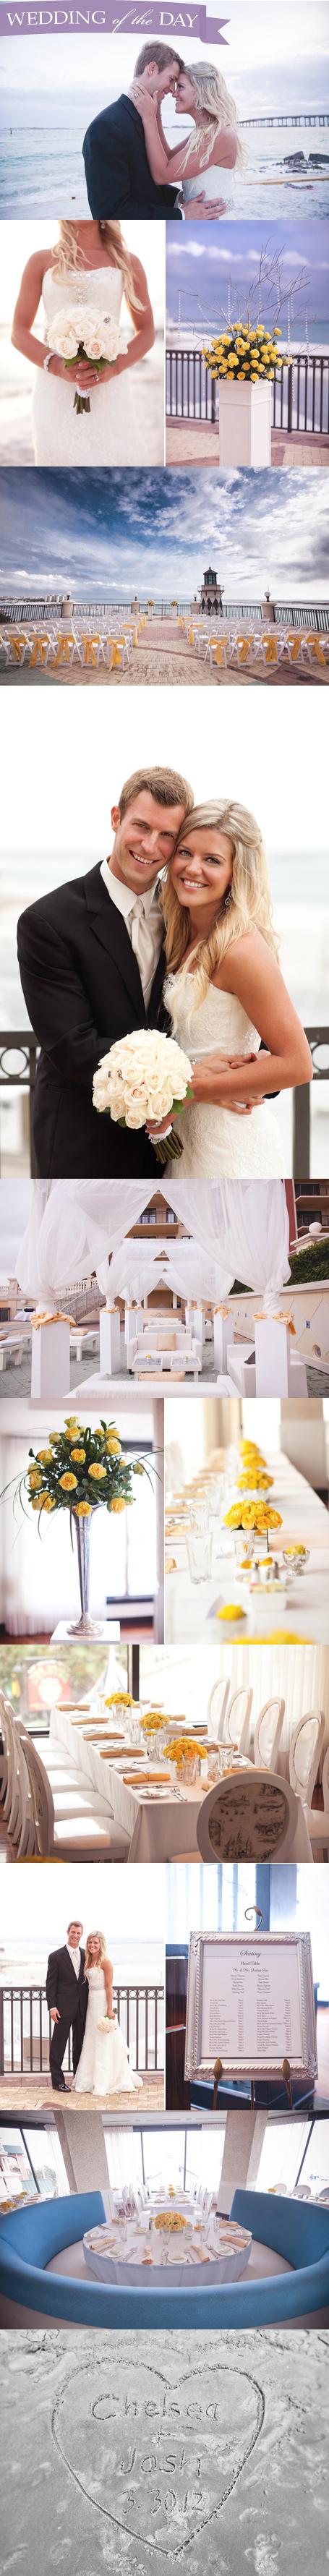 Wedding Blog - Wedding Details Blog